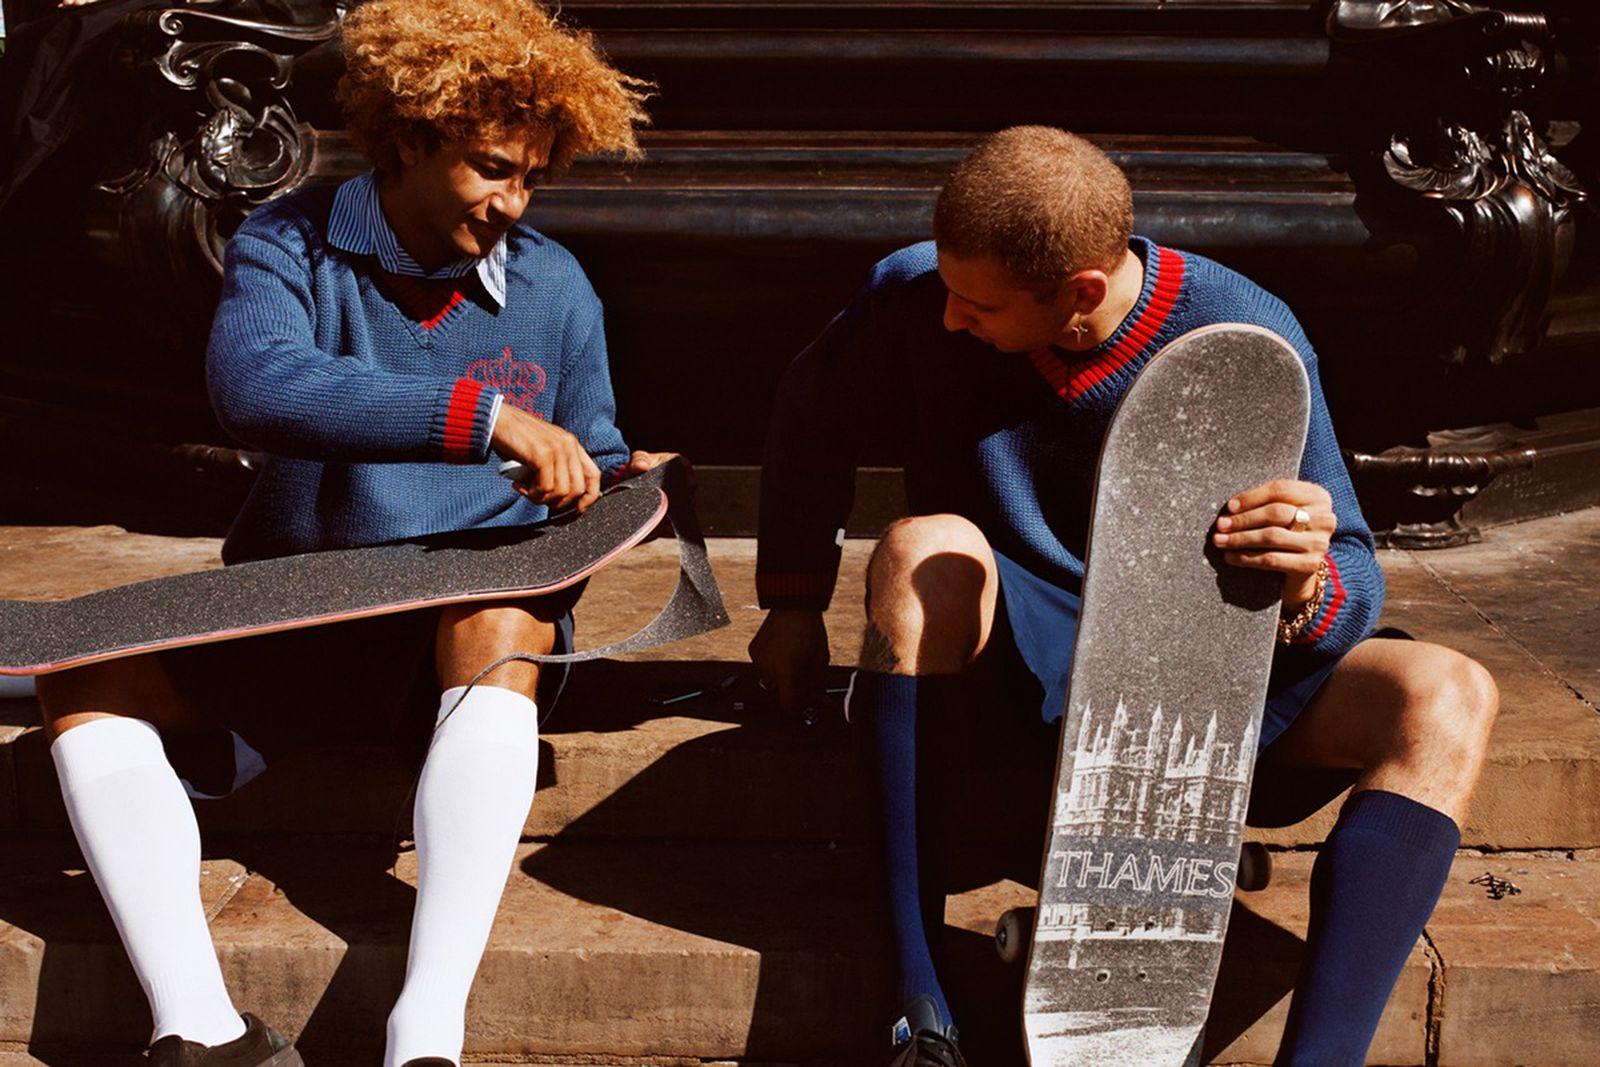 THAMES MMXX knit sweater skateboard